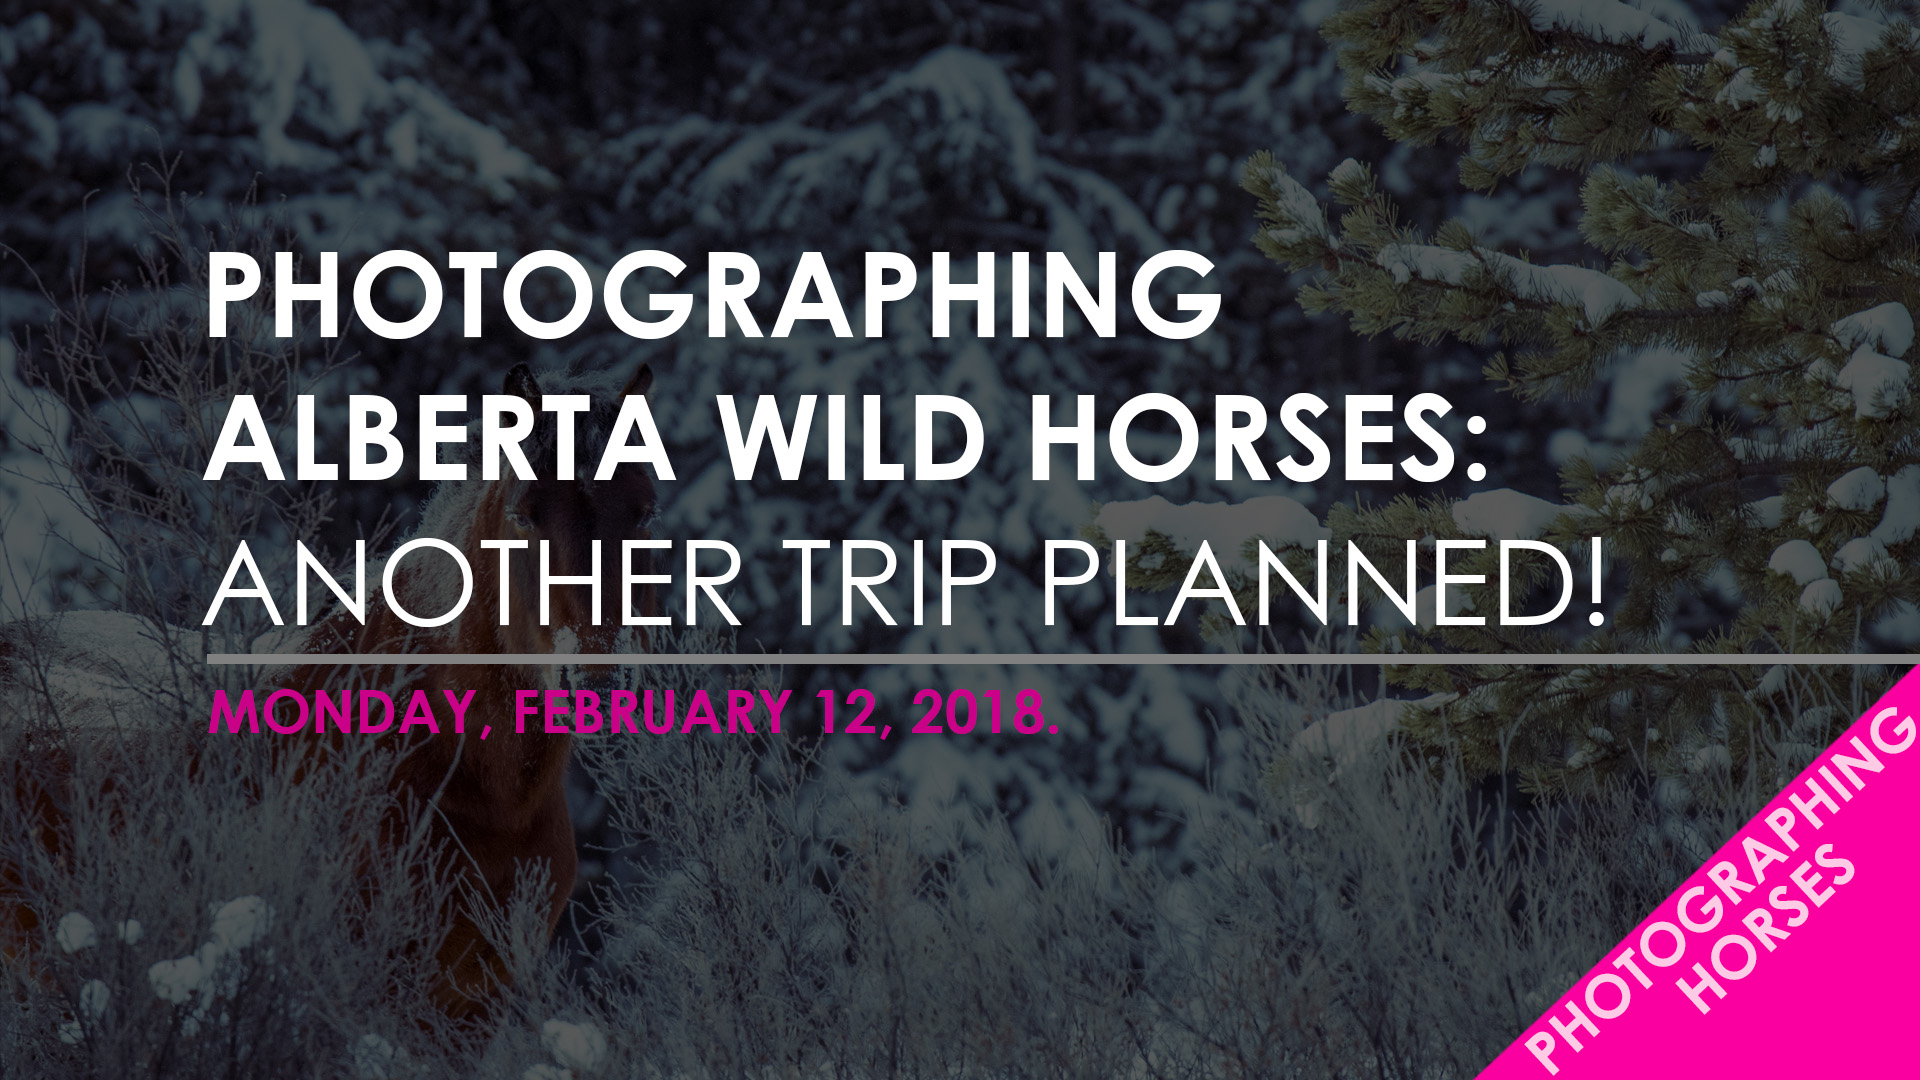 Blog Template - wild horses - trip planned.jpg